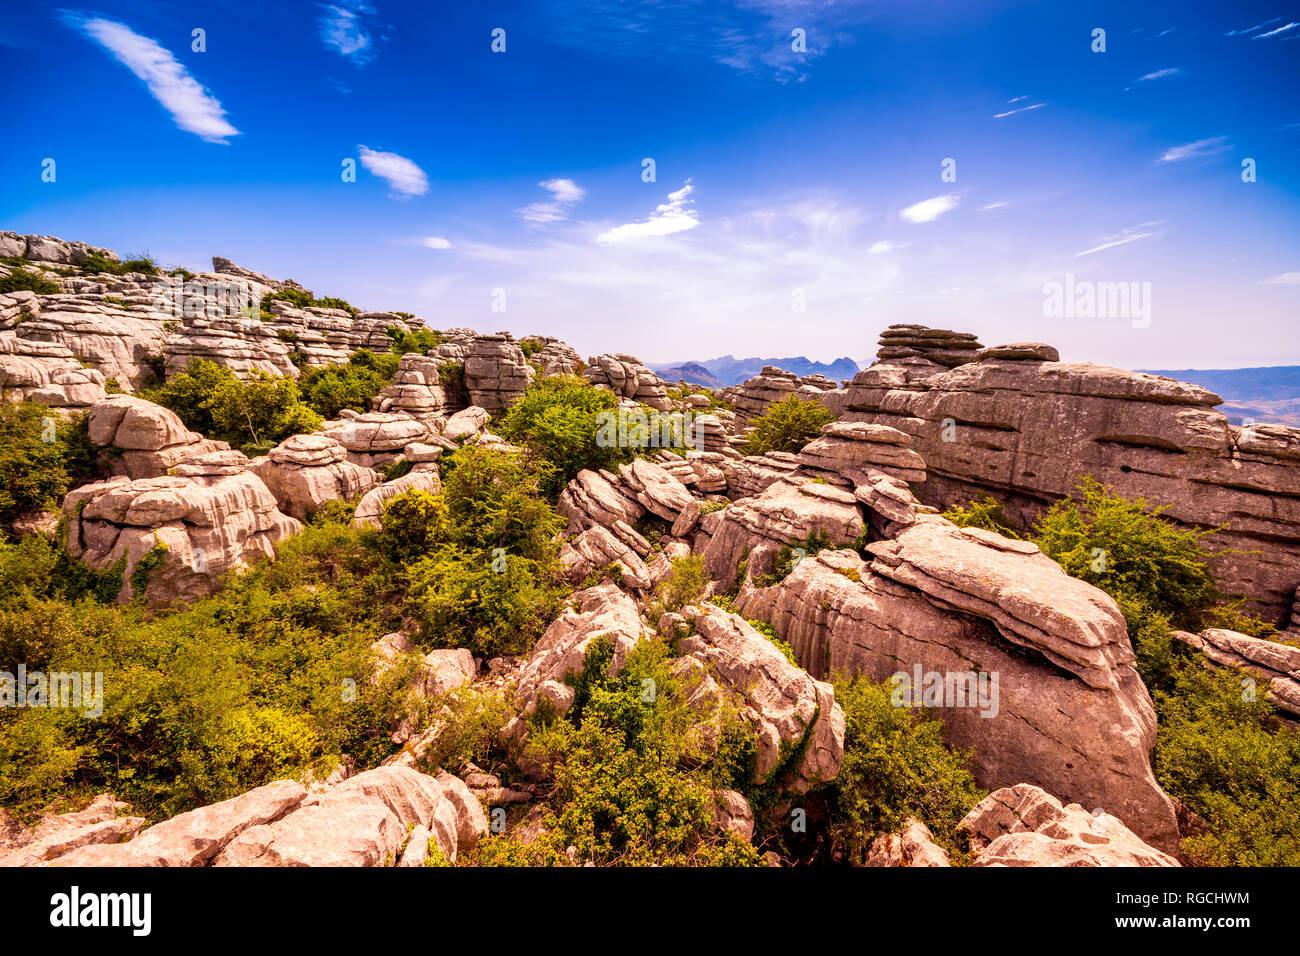 Spain, Málaga Province, Sierra del Torcal mountain range, El Torcal de Antequera nature reserve, limestone formations - Stock Image